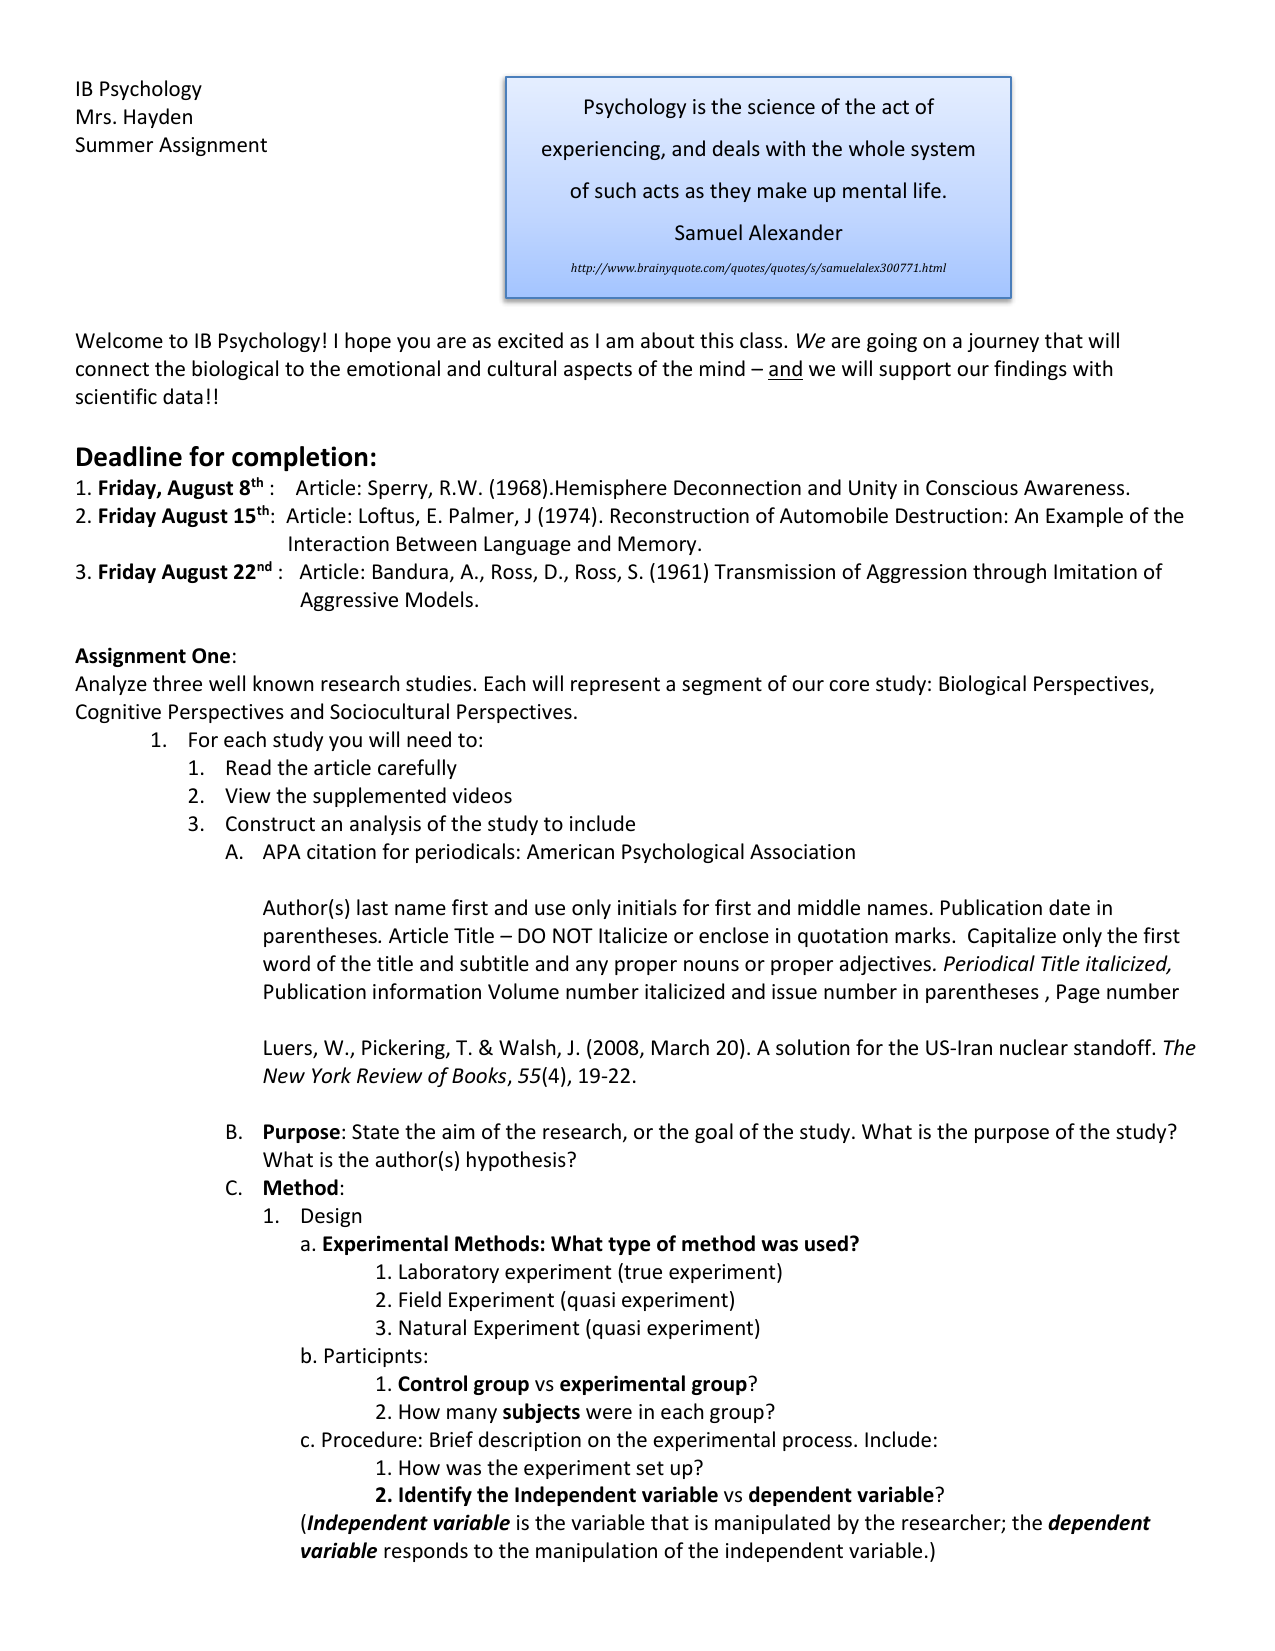 IB Psychology Summer Assignemnt 2014